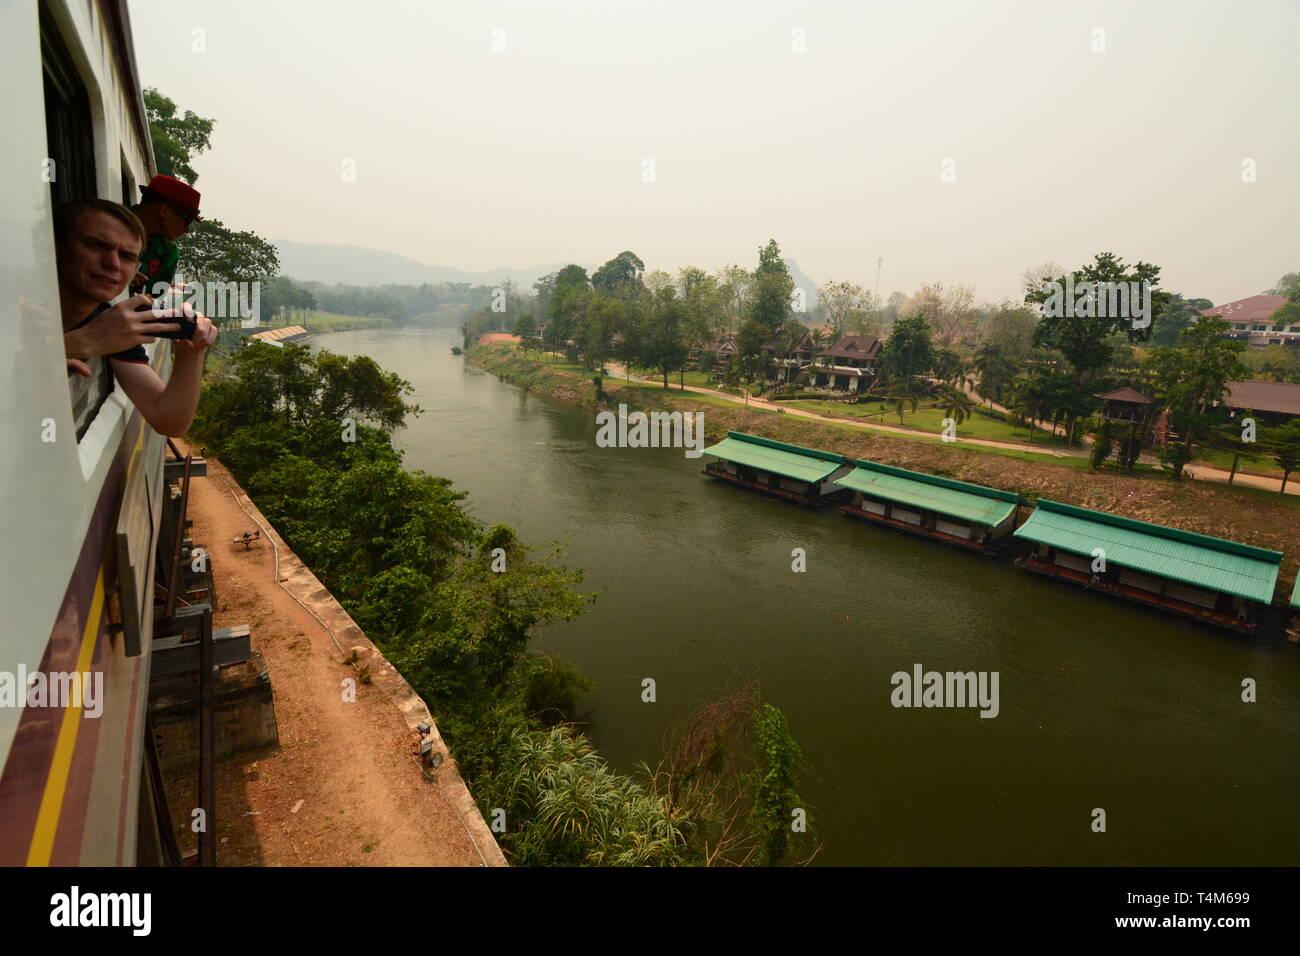 Travelling on the historic thai-burma railway. Kanchanaburi province. Thailand - Stock Image